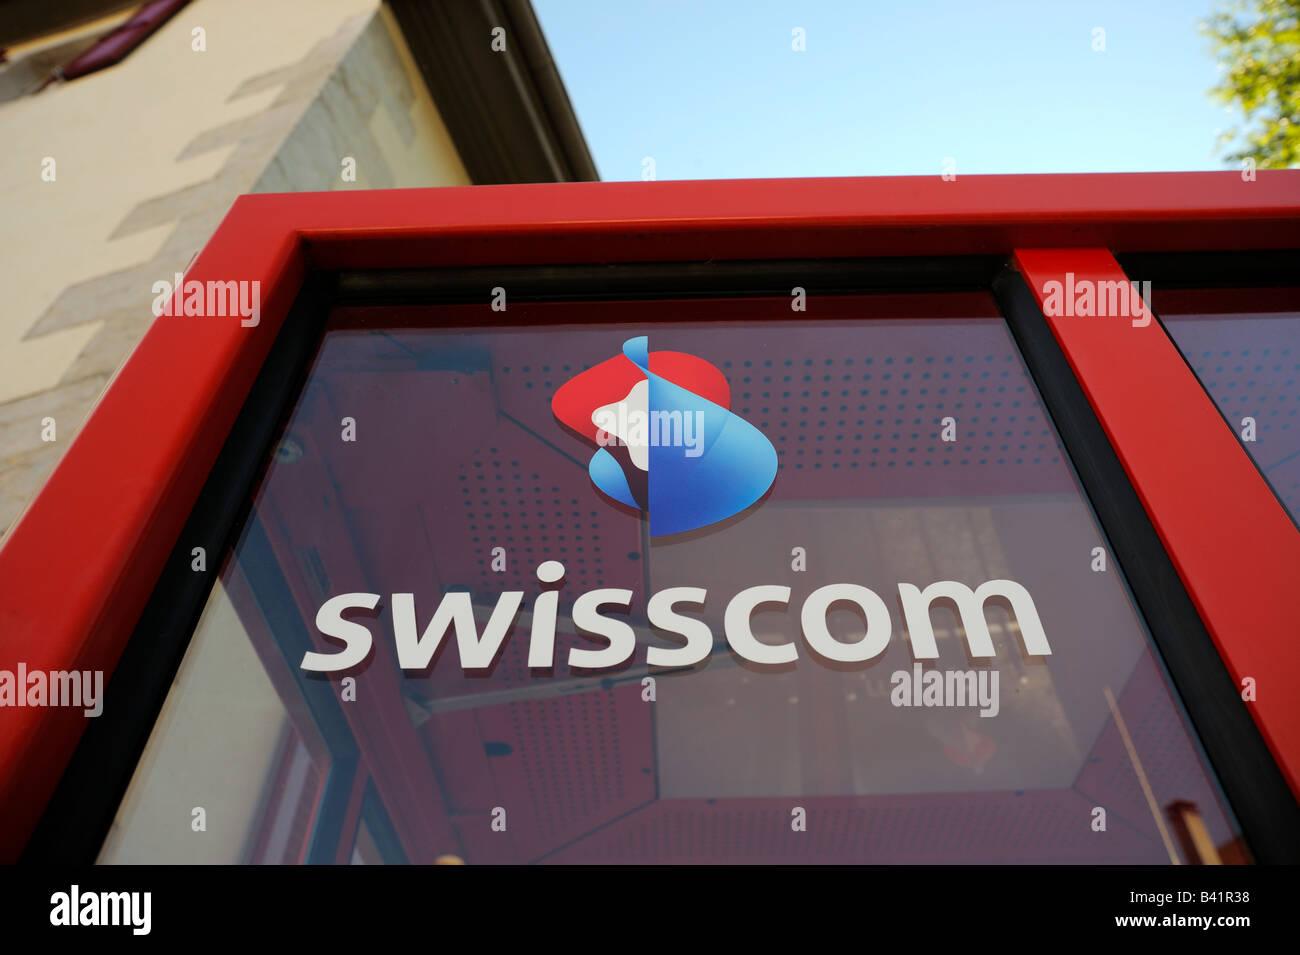 Telephone booth with swisscom logo on it. - Stock Image